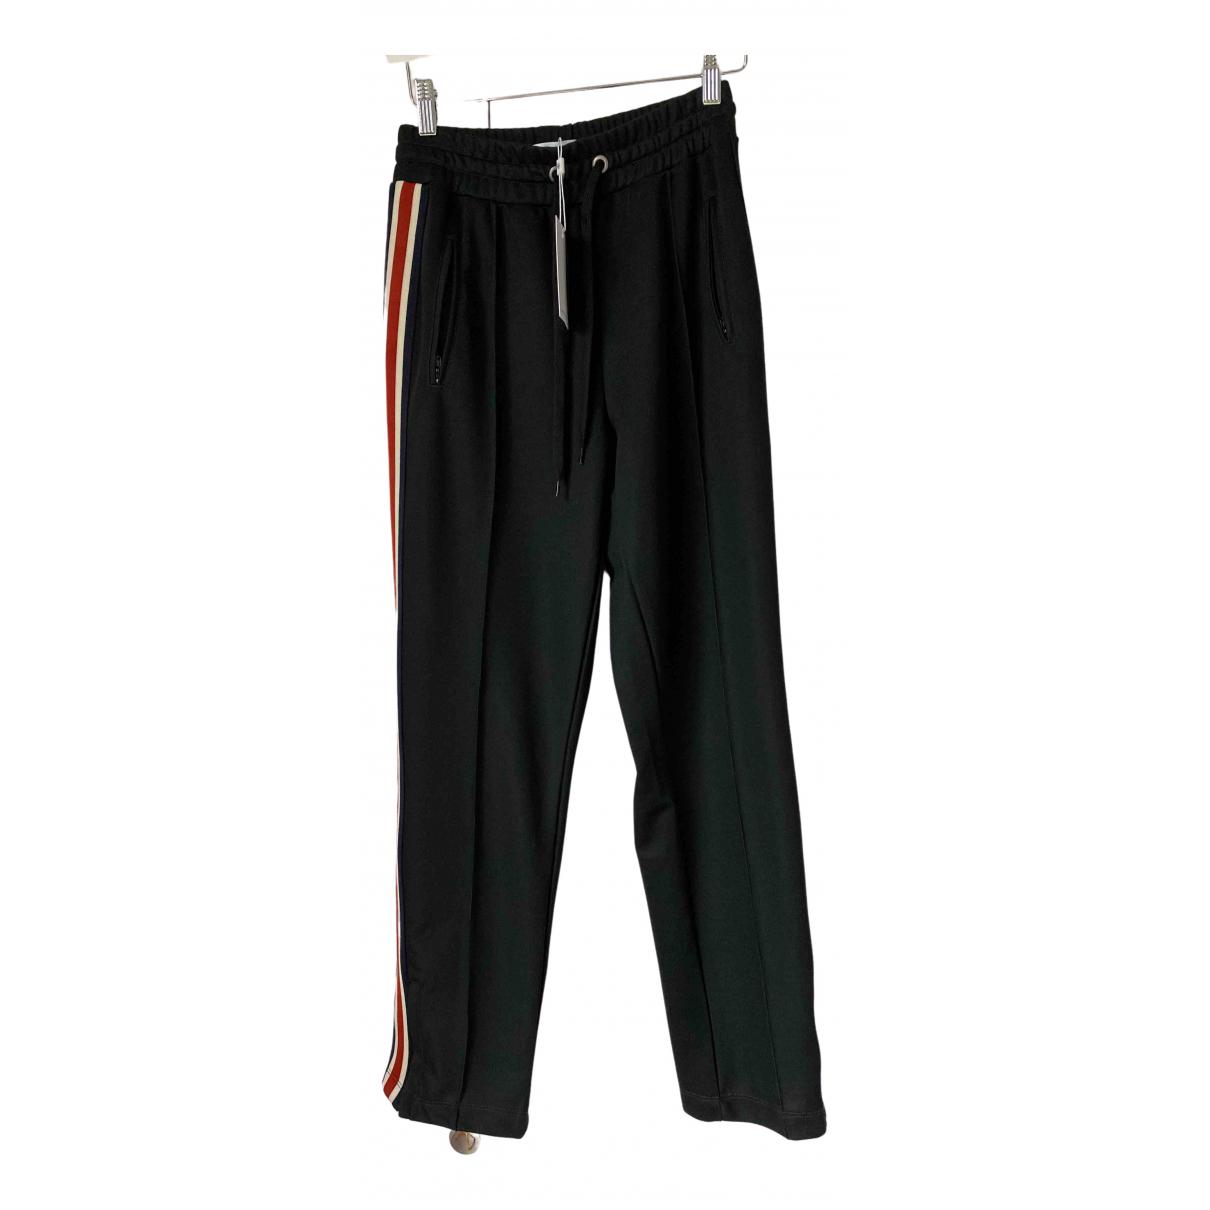 Anine Bing Spring Summer 2020 Black Cotton Trousers for Women XS International